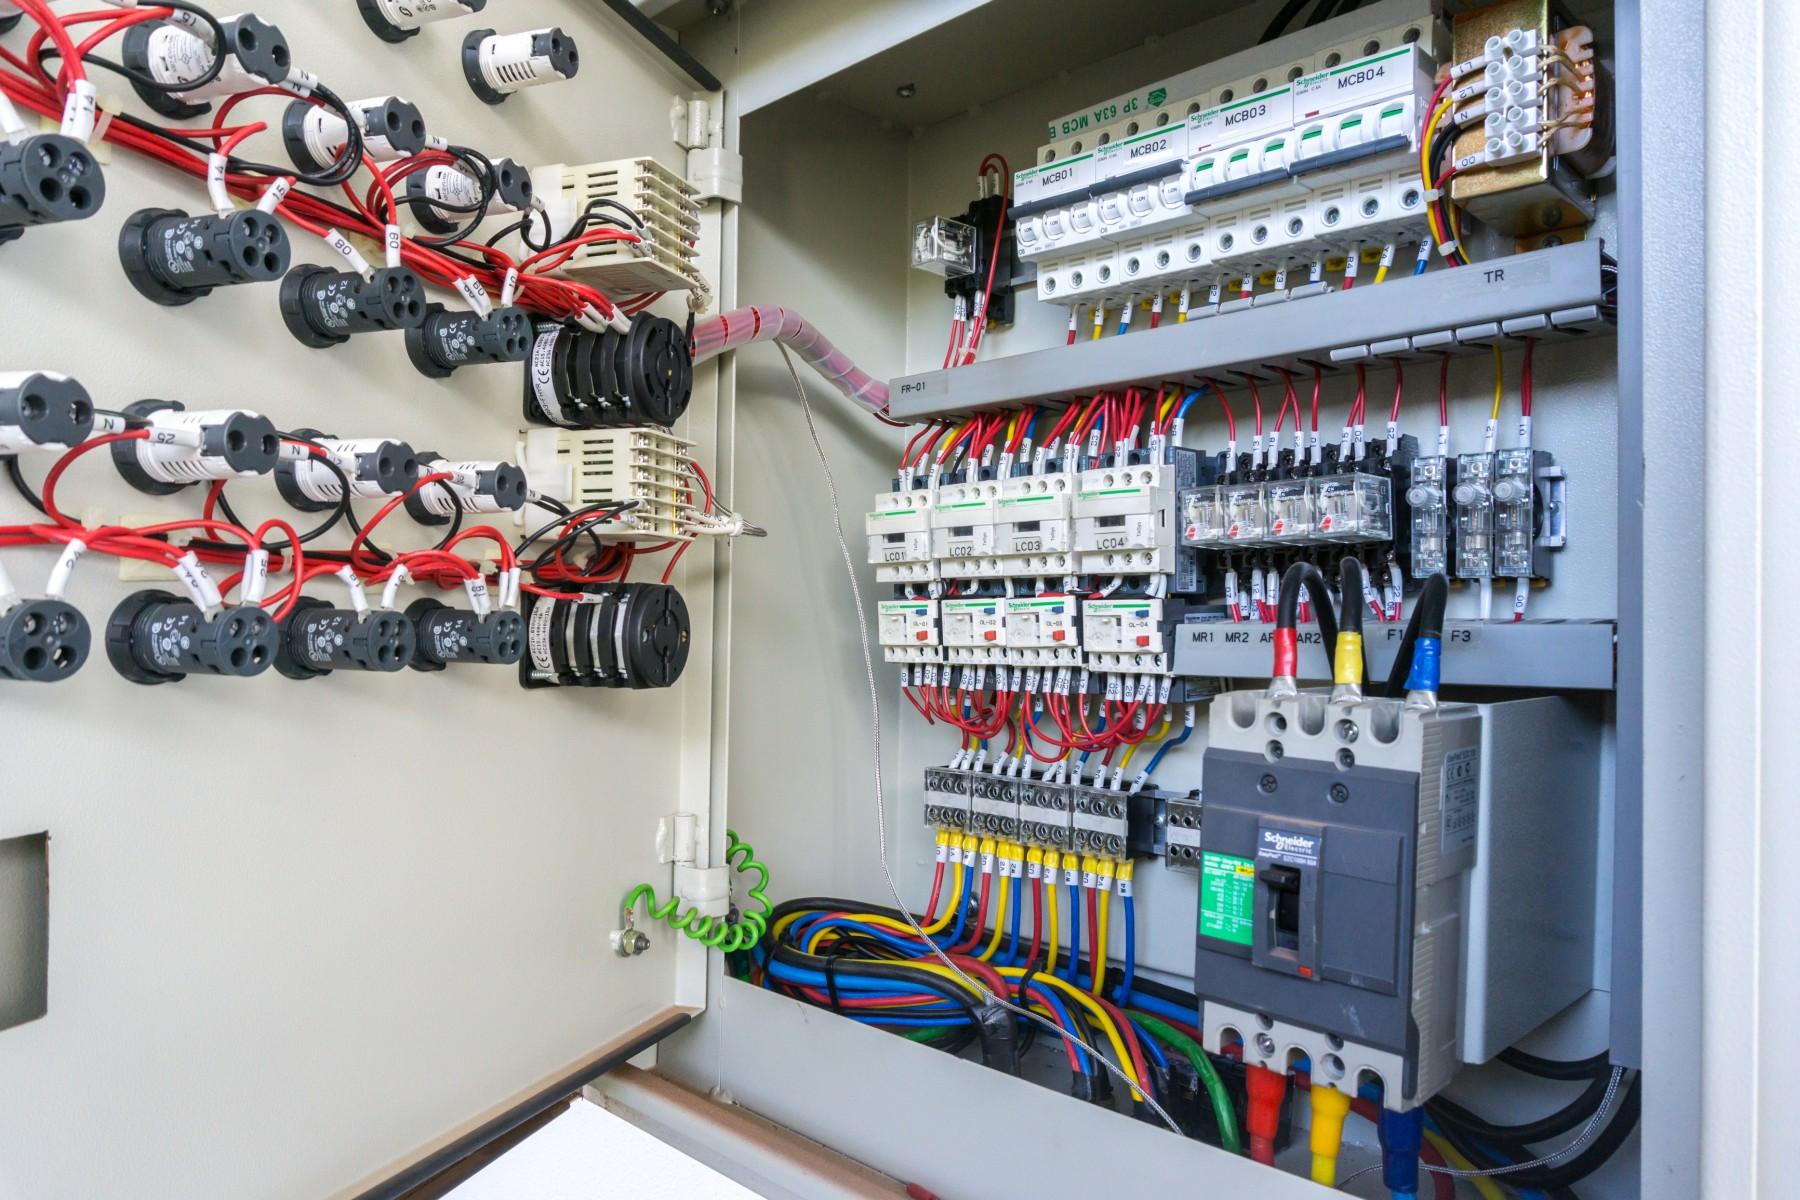 Schemi Quadri Elettrici Industriali : Dmz technology automazione industriale & quadri elettrici italia